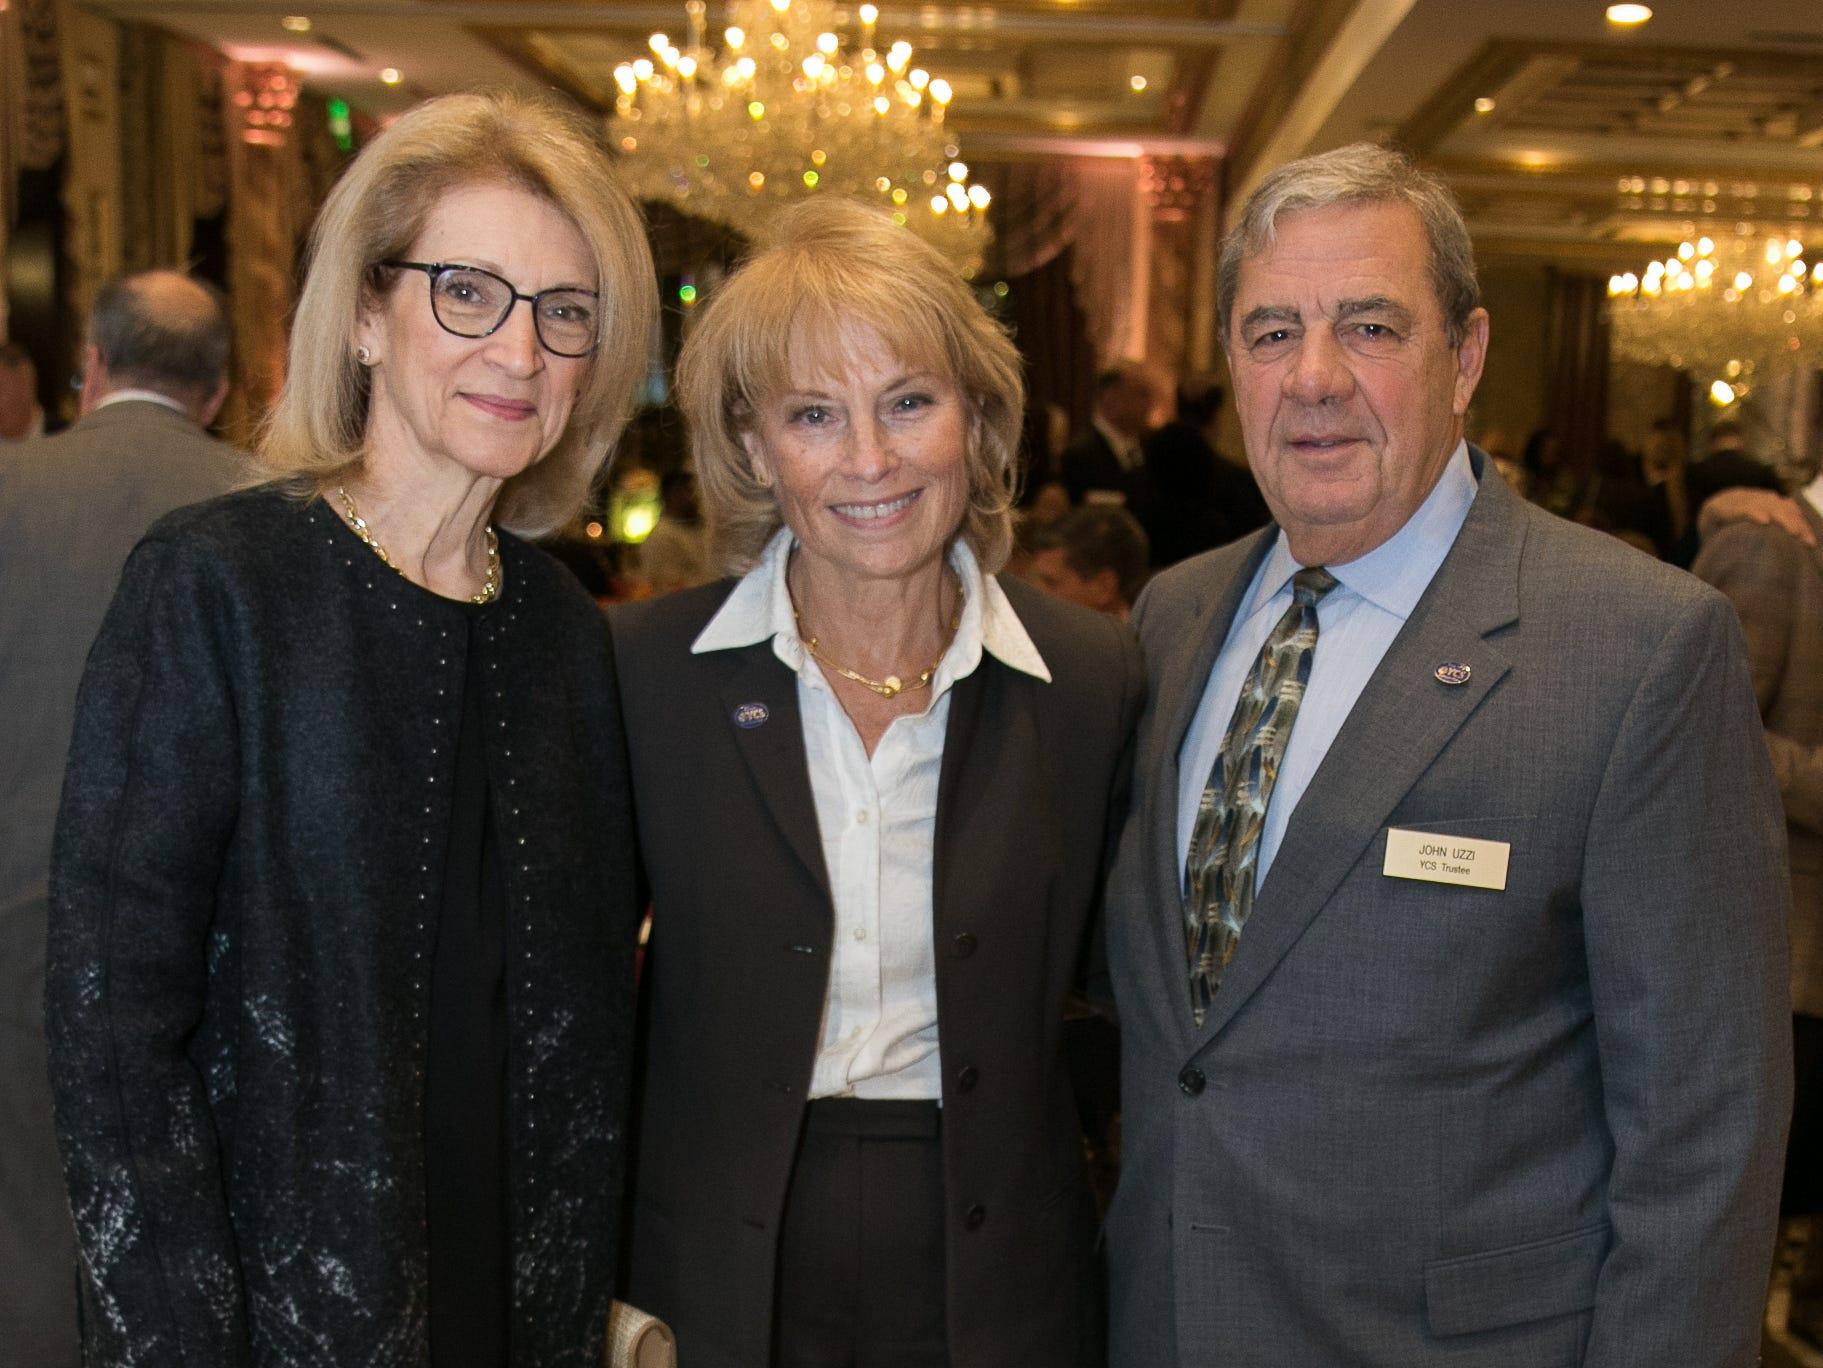 Ellen Jacobs, Faye Samuels, John Uzzi. Youth Consultation Service – YCS held their 100th Anniversary Celebration at Seasons in Washington Township.11/5/2018